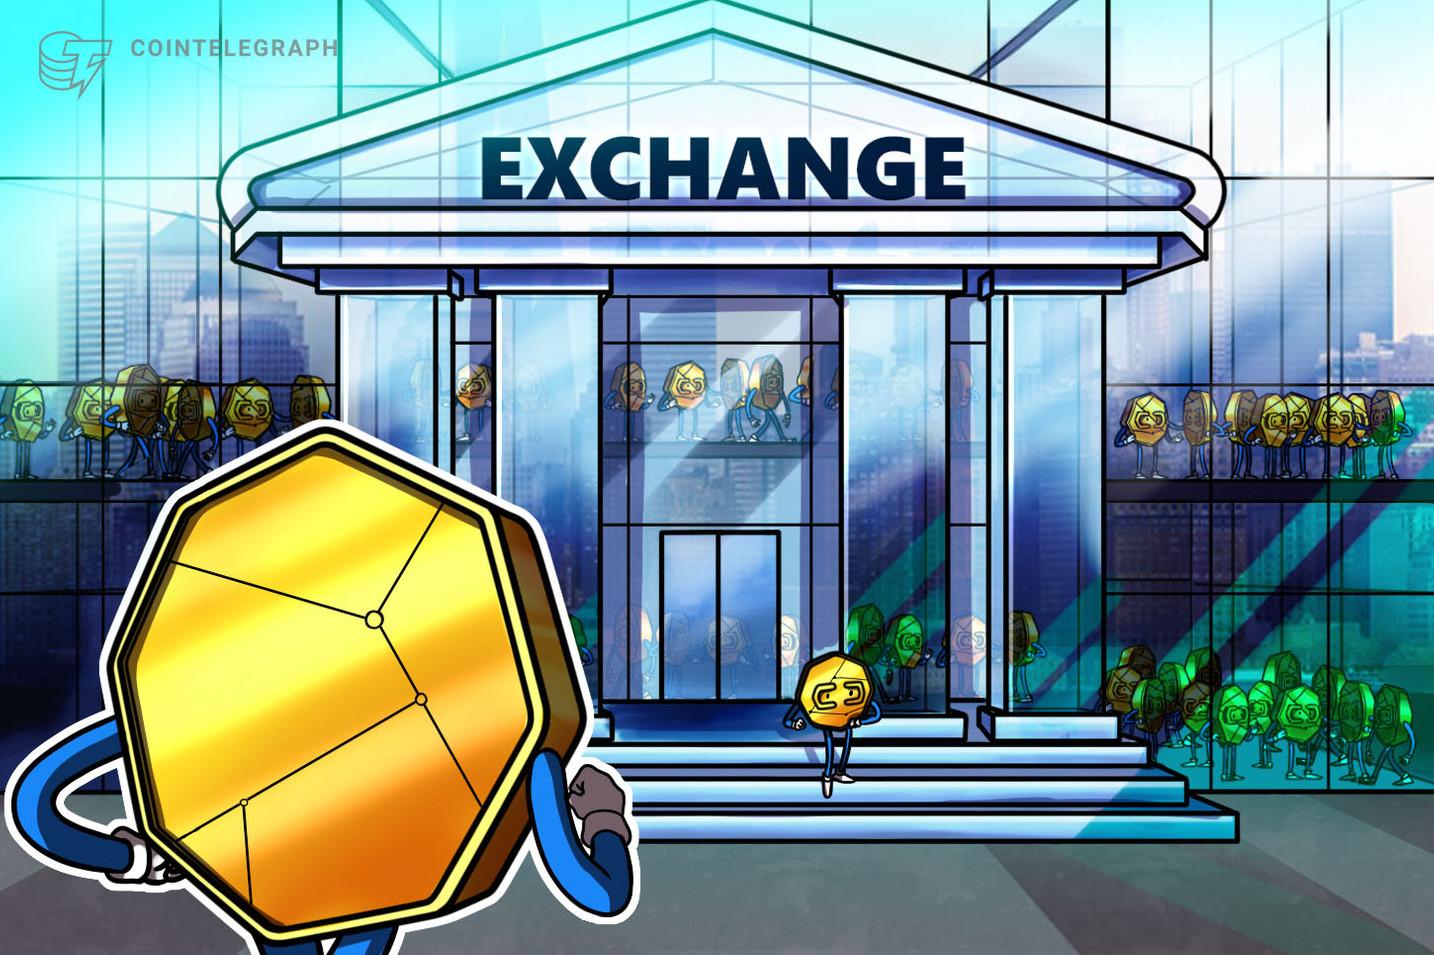 Mexo anuncia la integración de LatamEx para facilitar compras de criptomonedas con monedas fiat latinoamericanas